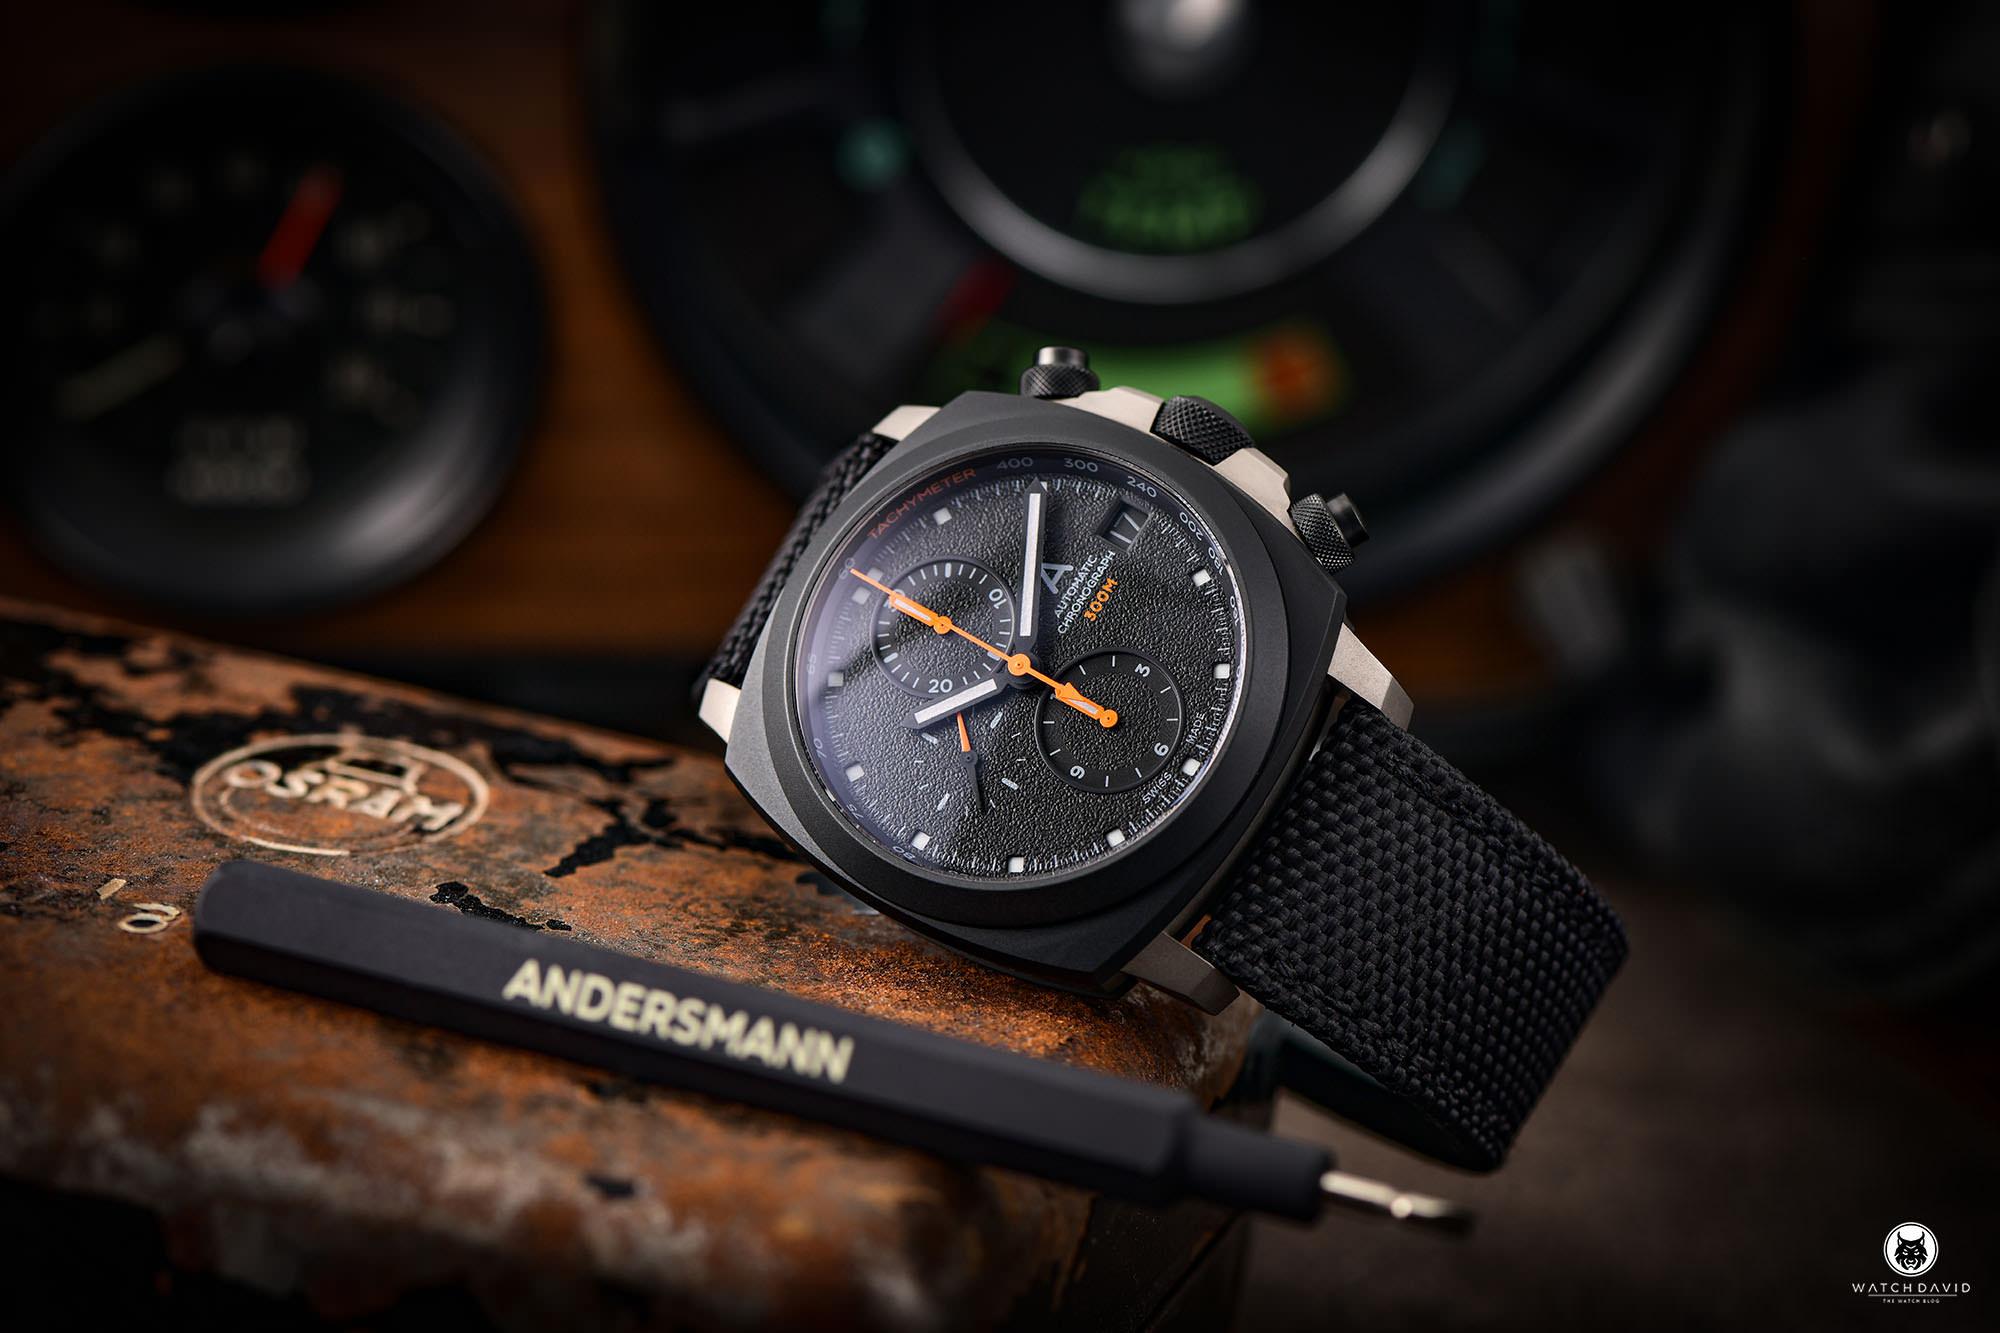 Andersmann CHRONOGRAPH DLC ANN0683 Review